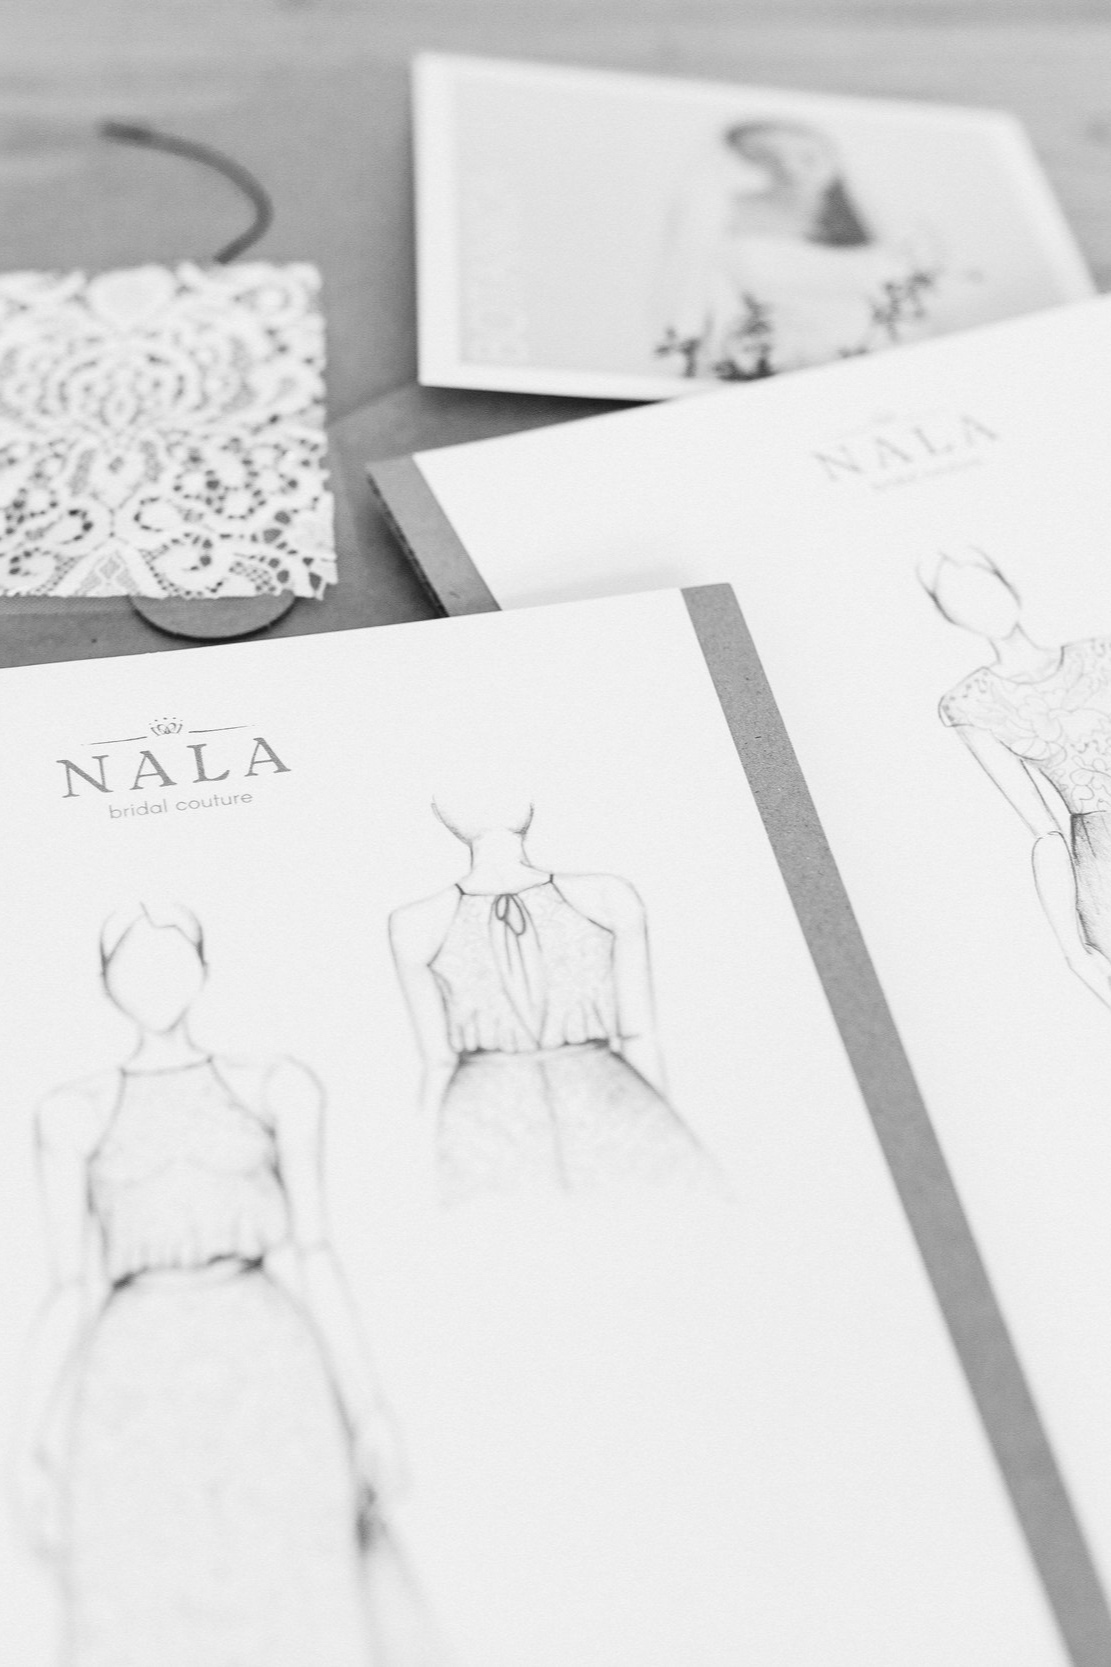 Nala_design.jpg